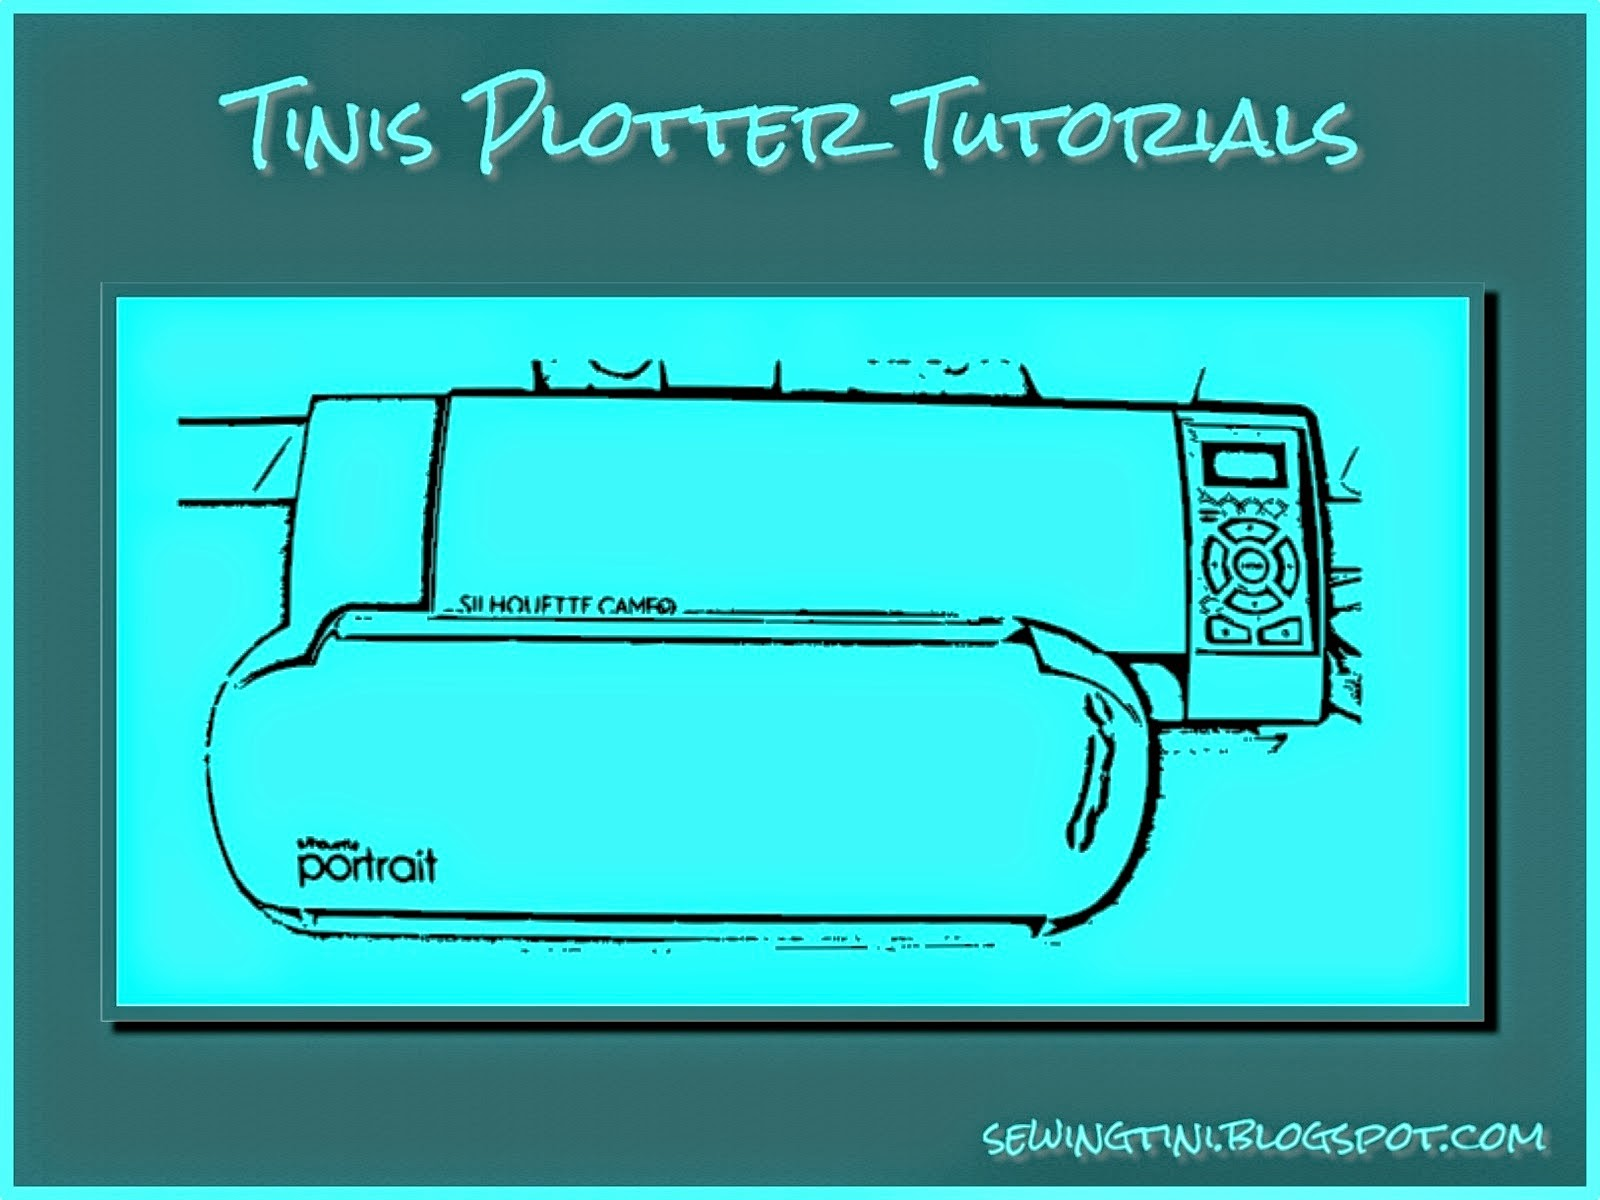 Tinis Plotter-Tutorials - Folge 6 - Offset